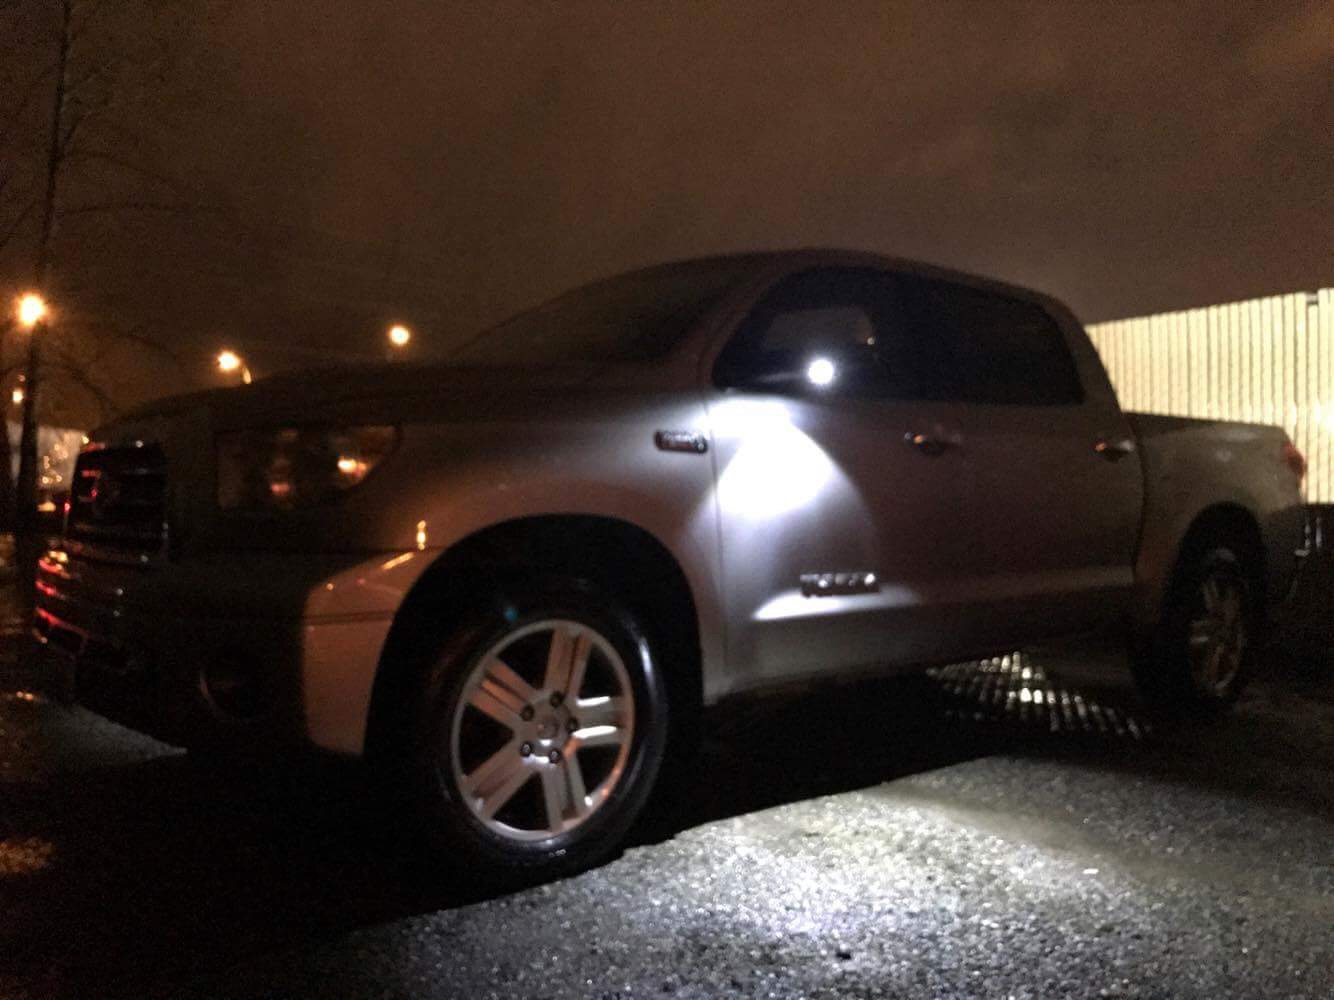 Toyota Led Mirror Puddle Light Kit Lumawerx